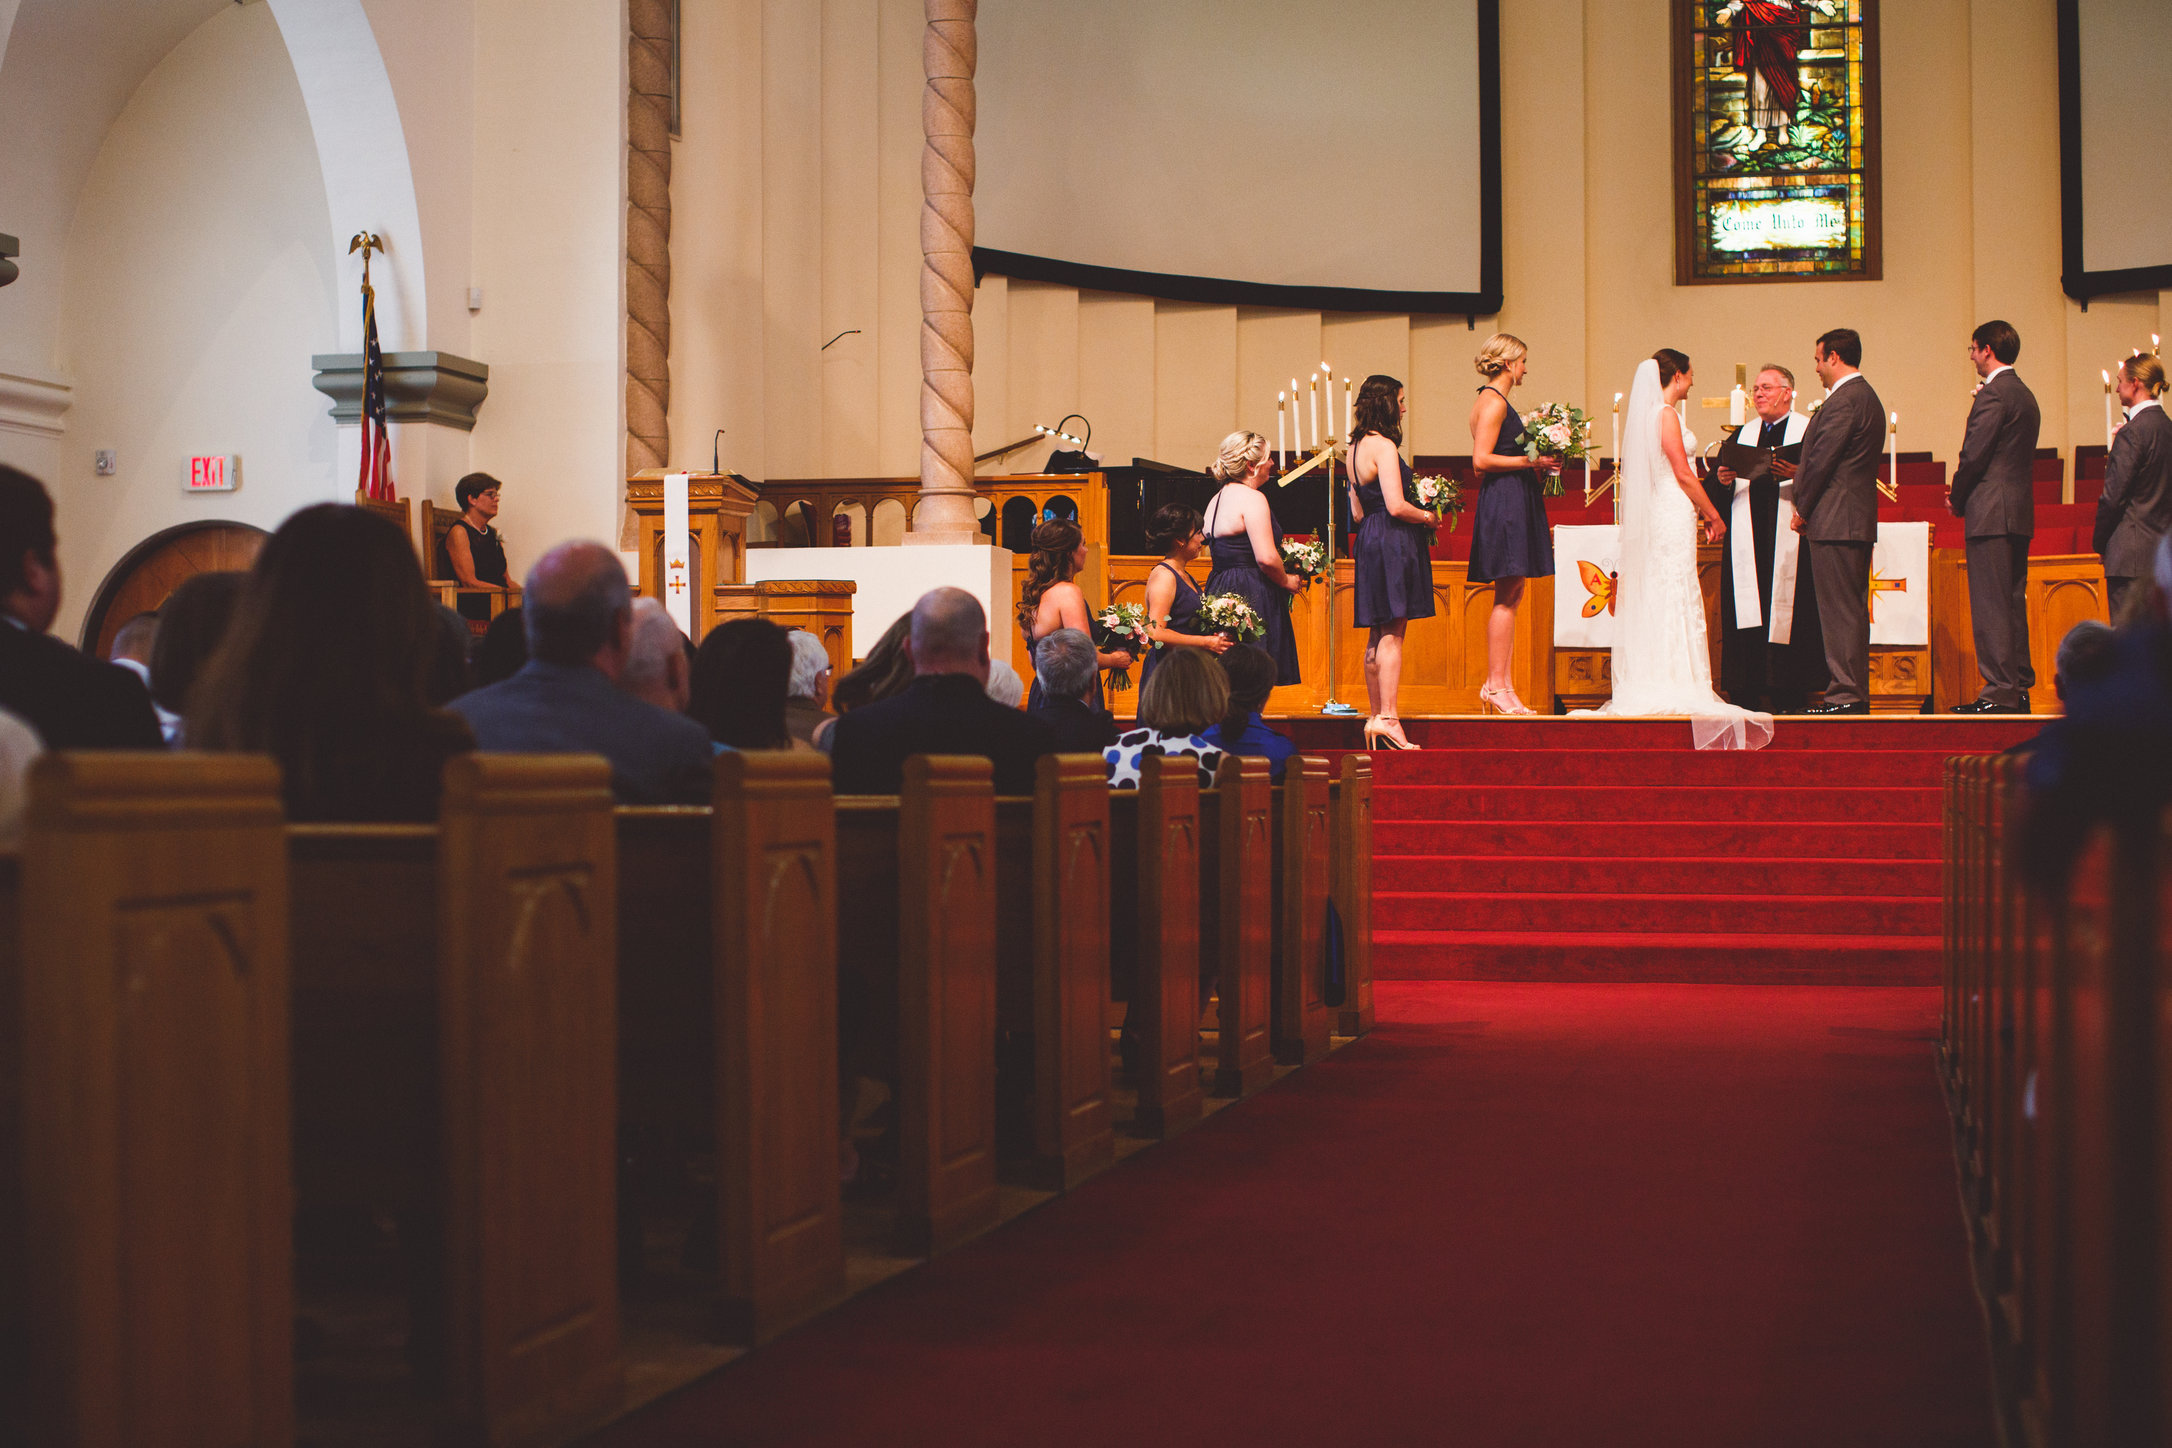 SandC-wedding-195.jpg